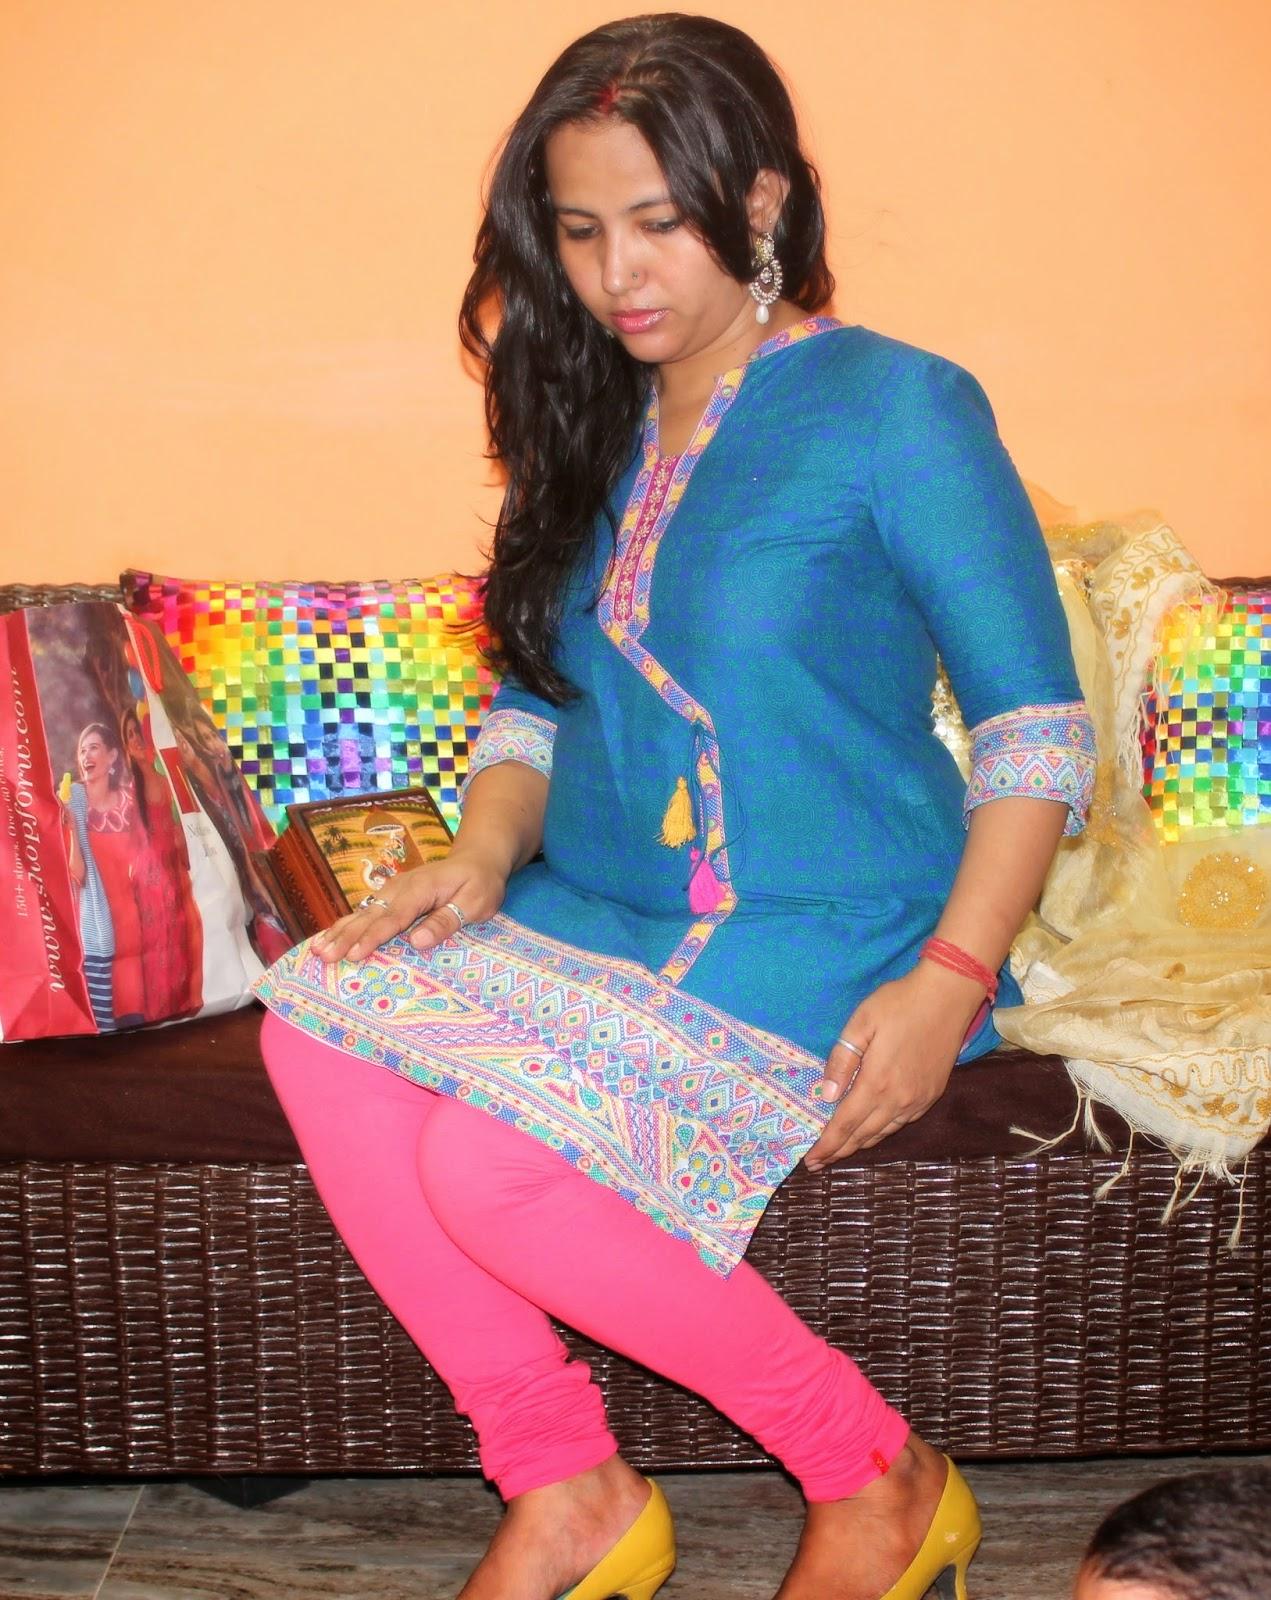 Hot indian girls in leggings